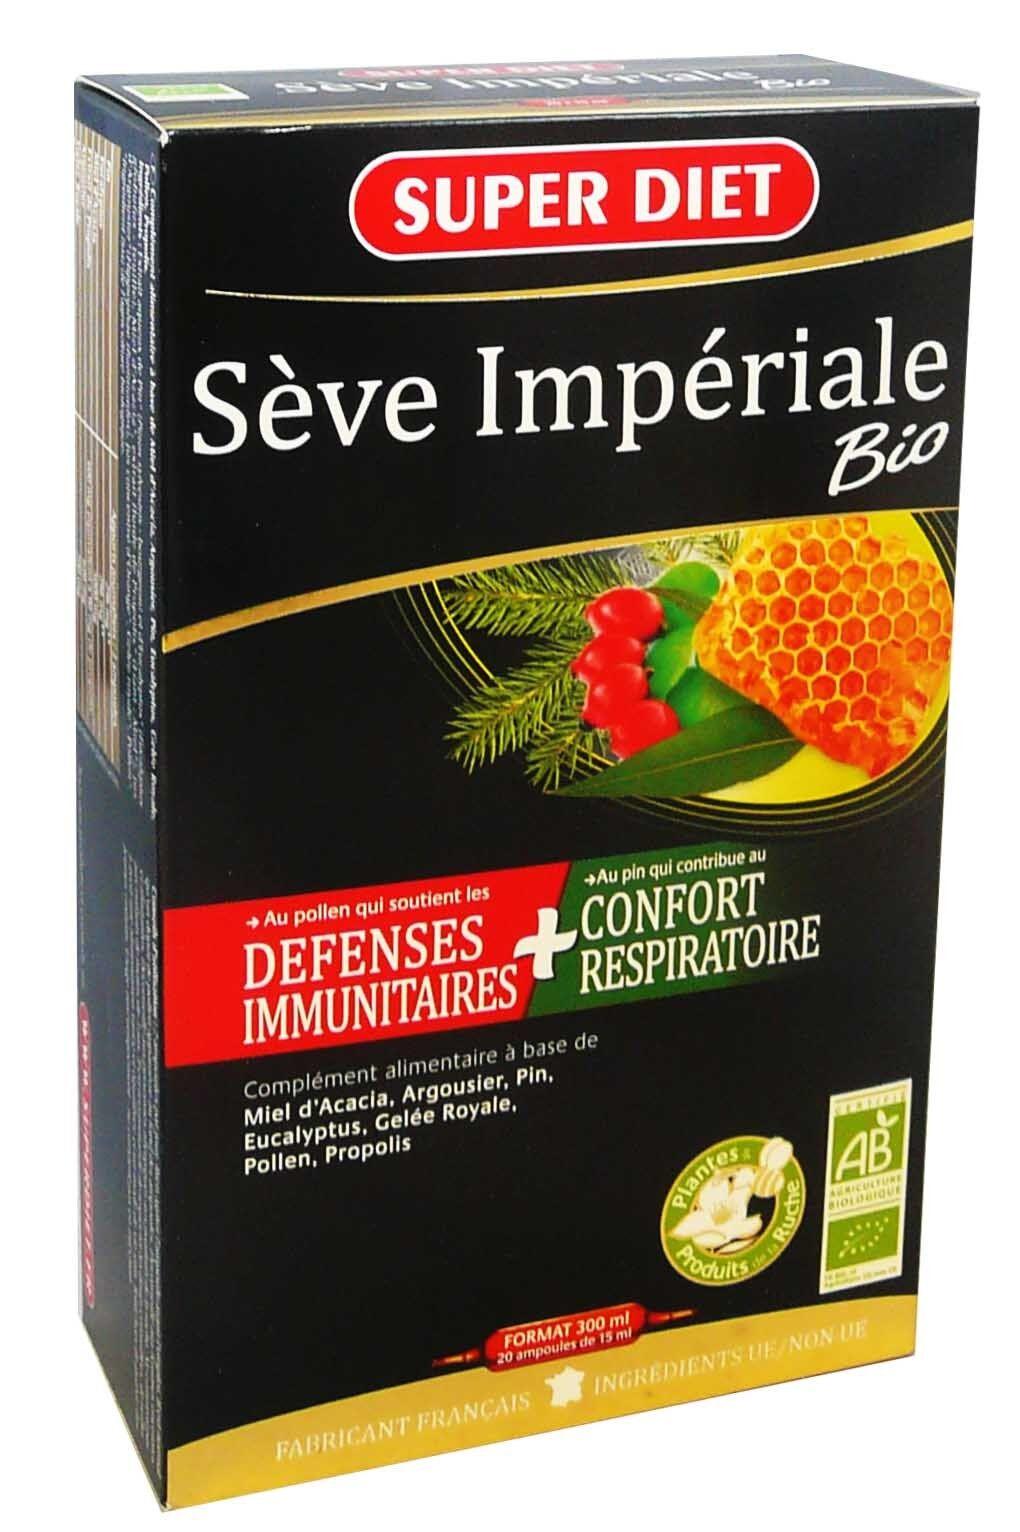 Super diet seve imperiale bio 300ml